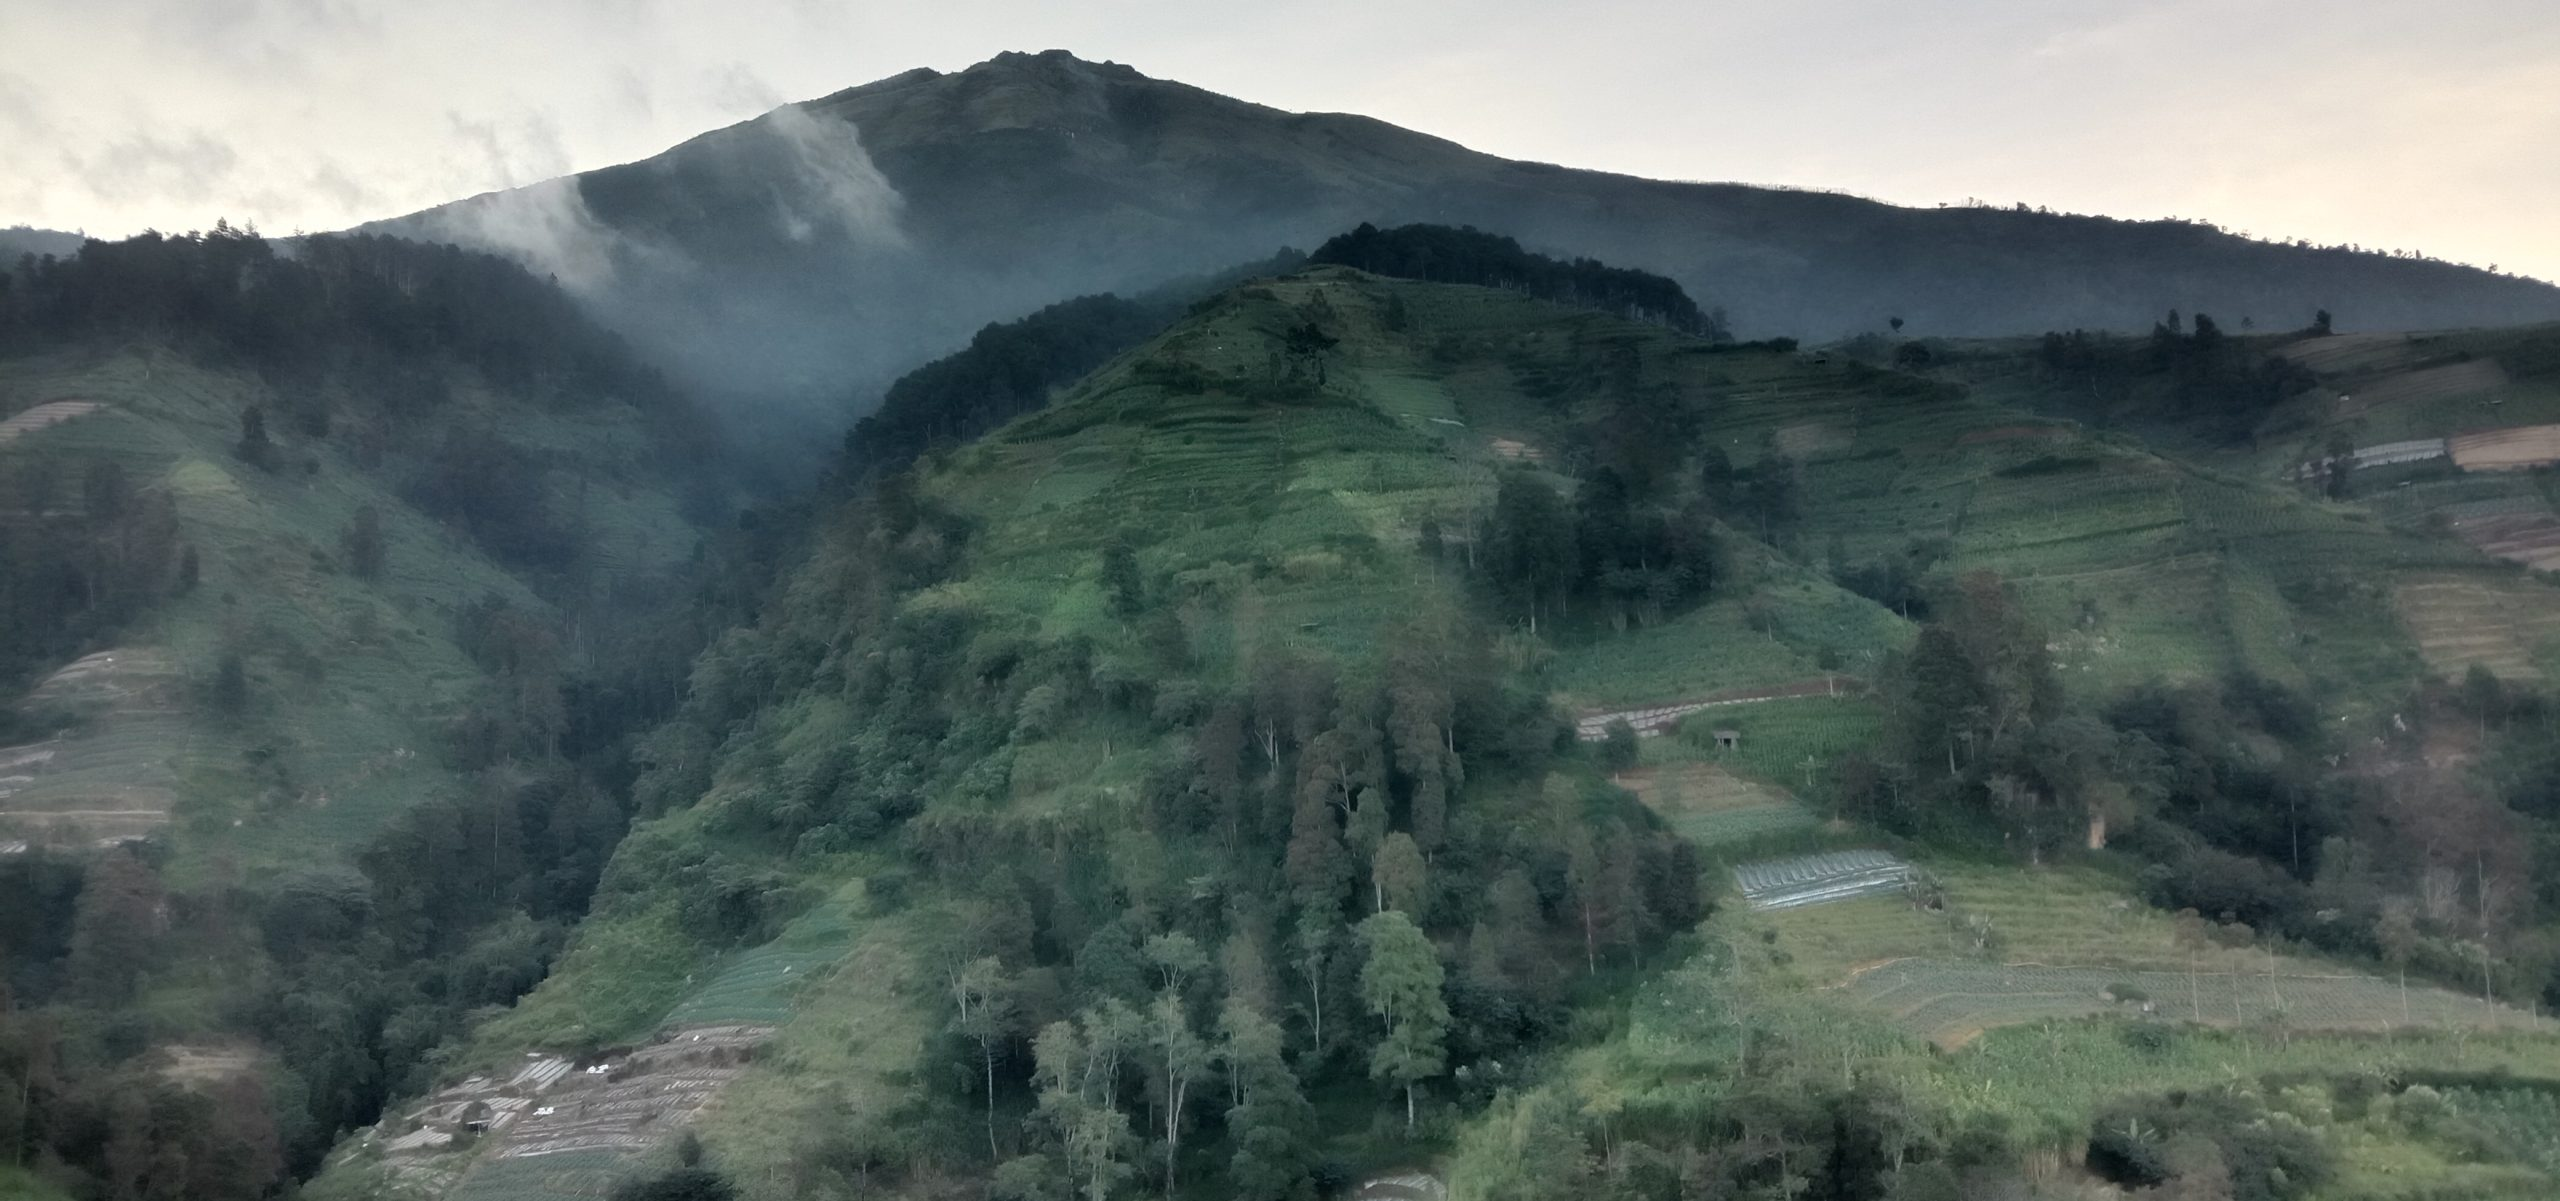 Photo of Jalur Pendakian Gunung Sumbing via Mangli Dibuka lagi